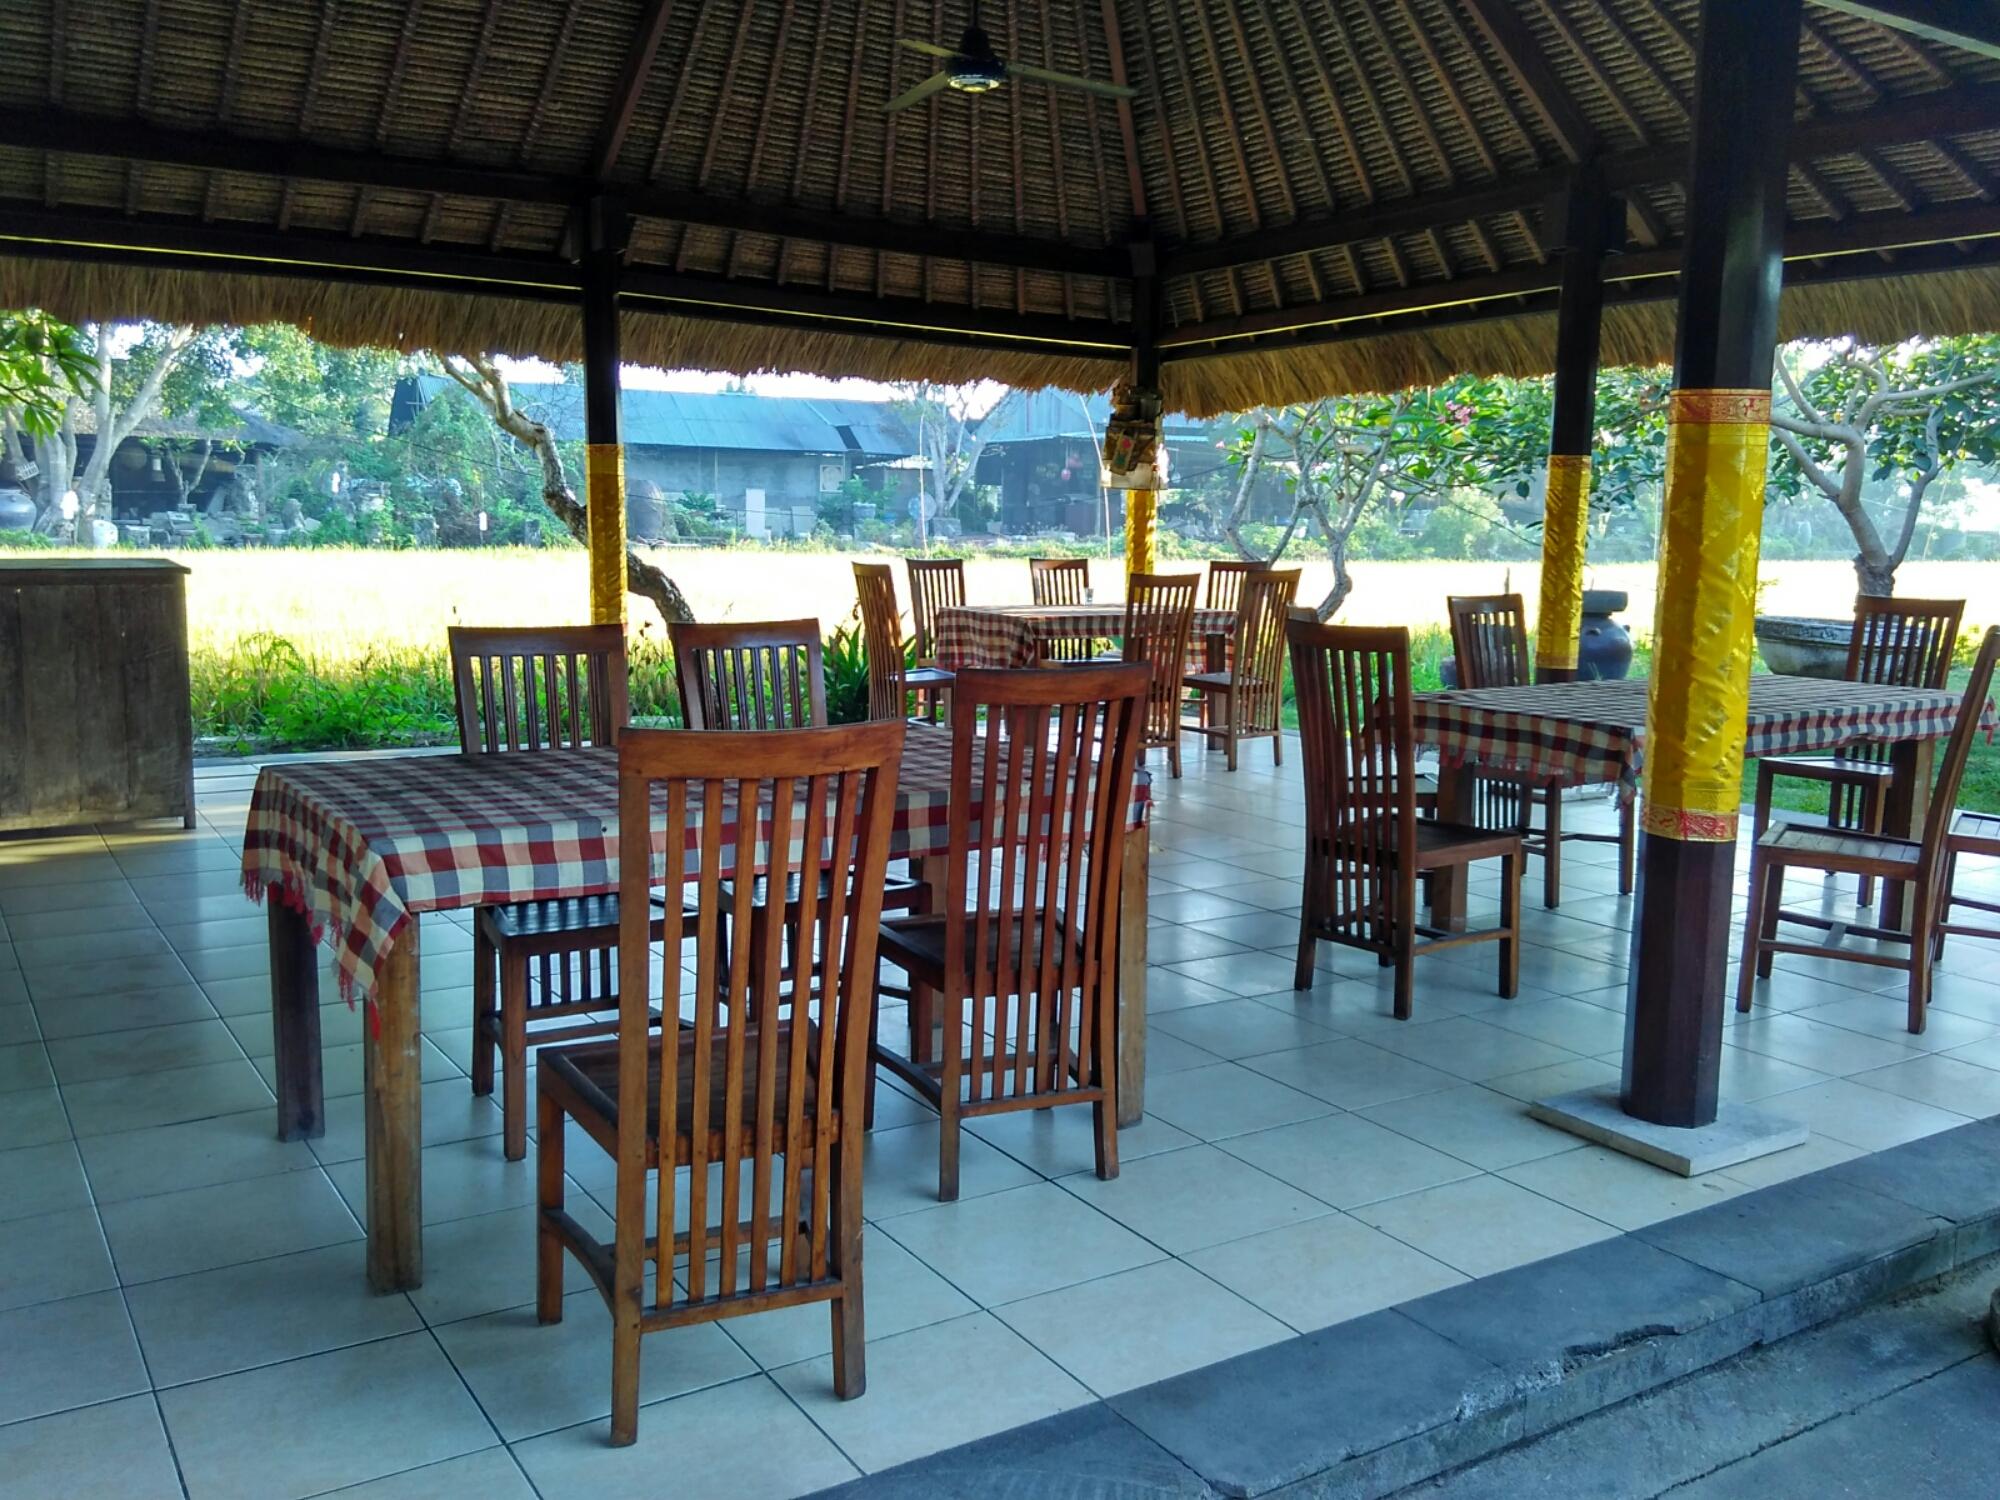 Desa Budaya Kertalangu Tony Sudhana Image Potensi Kota Denpasar